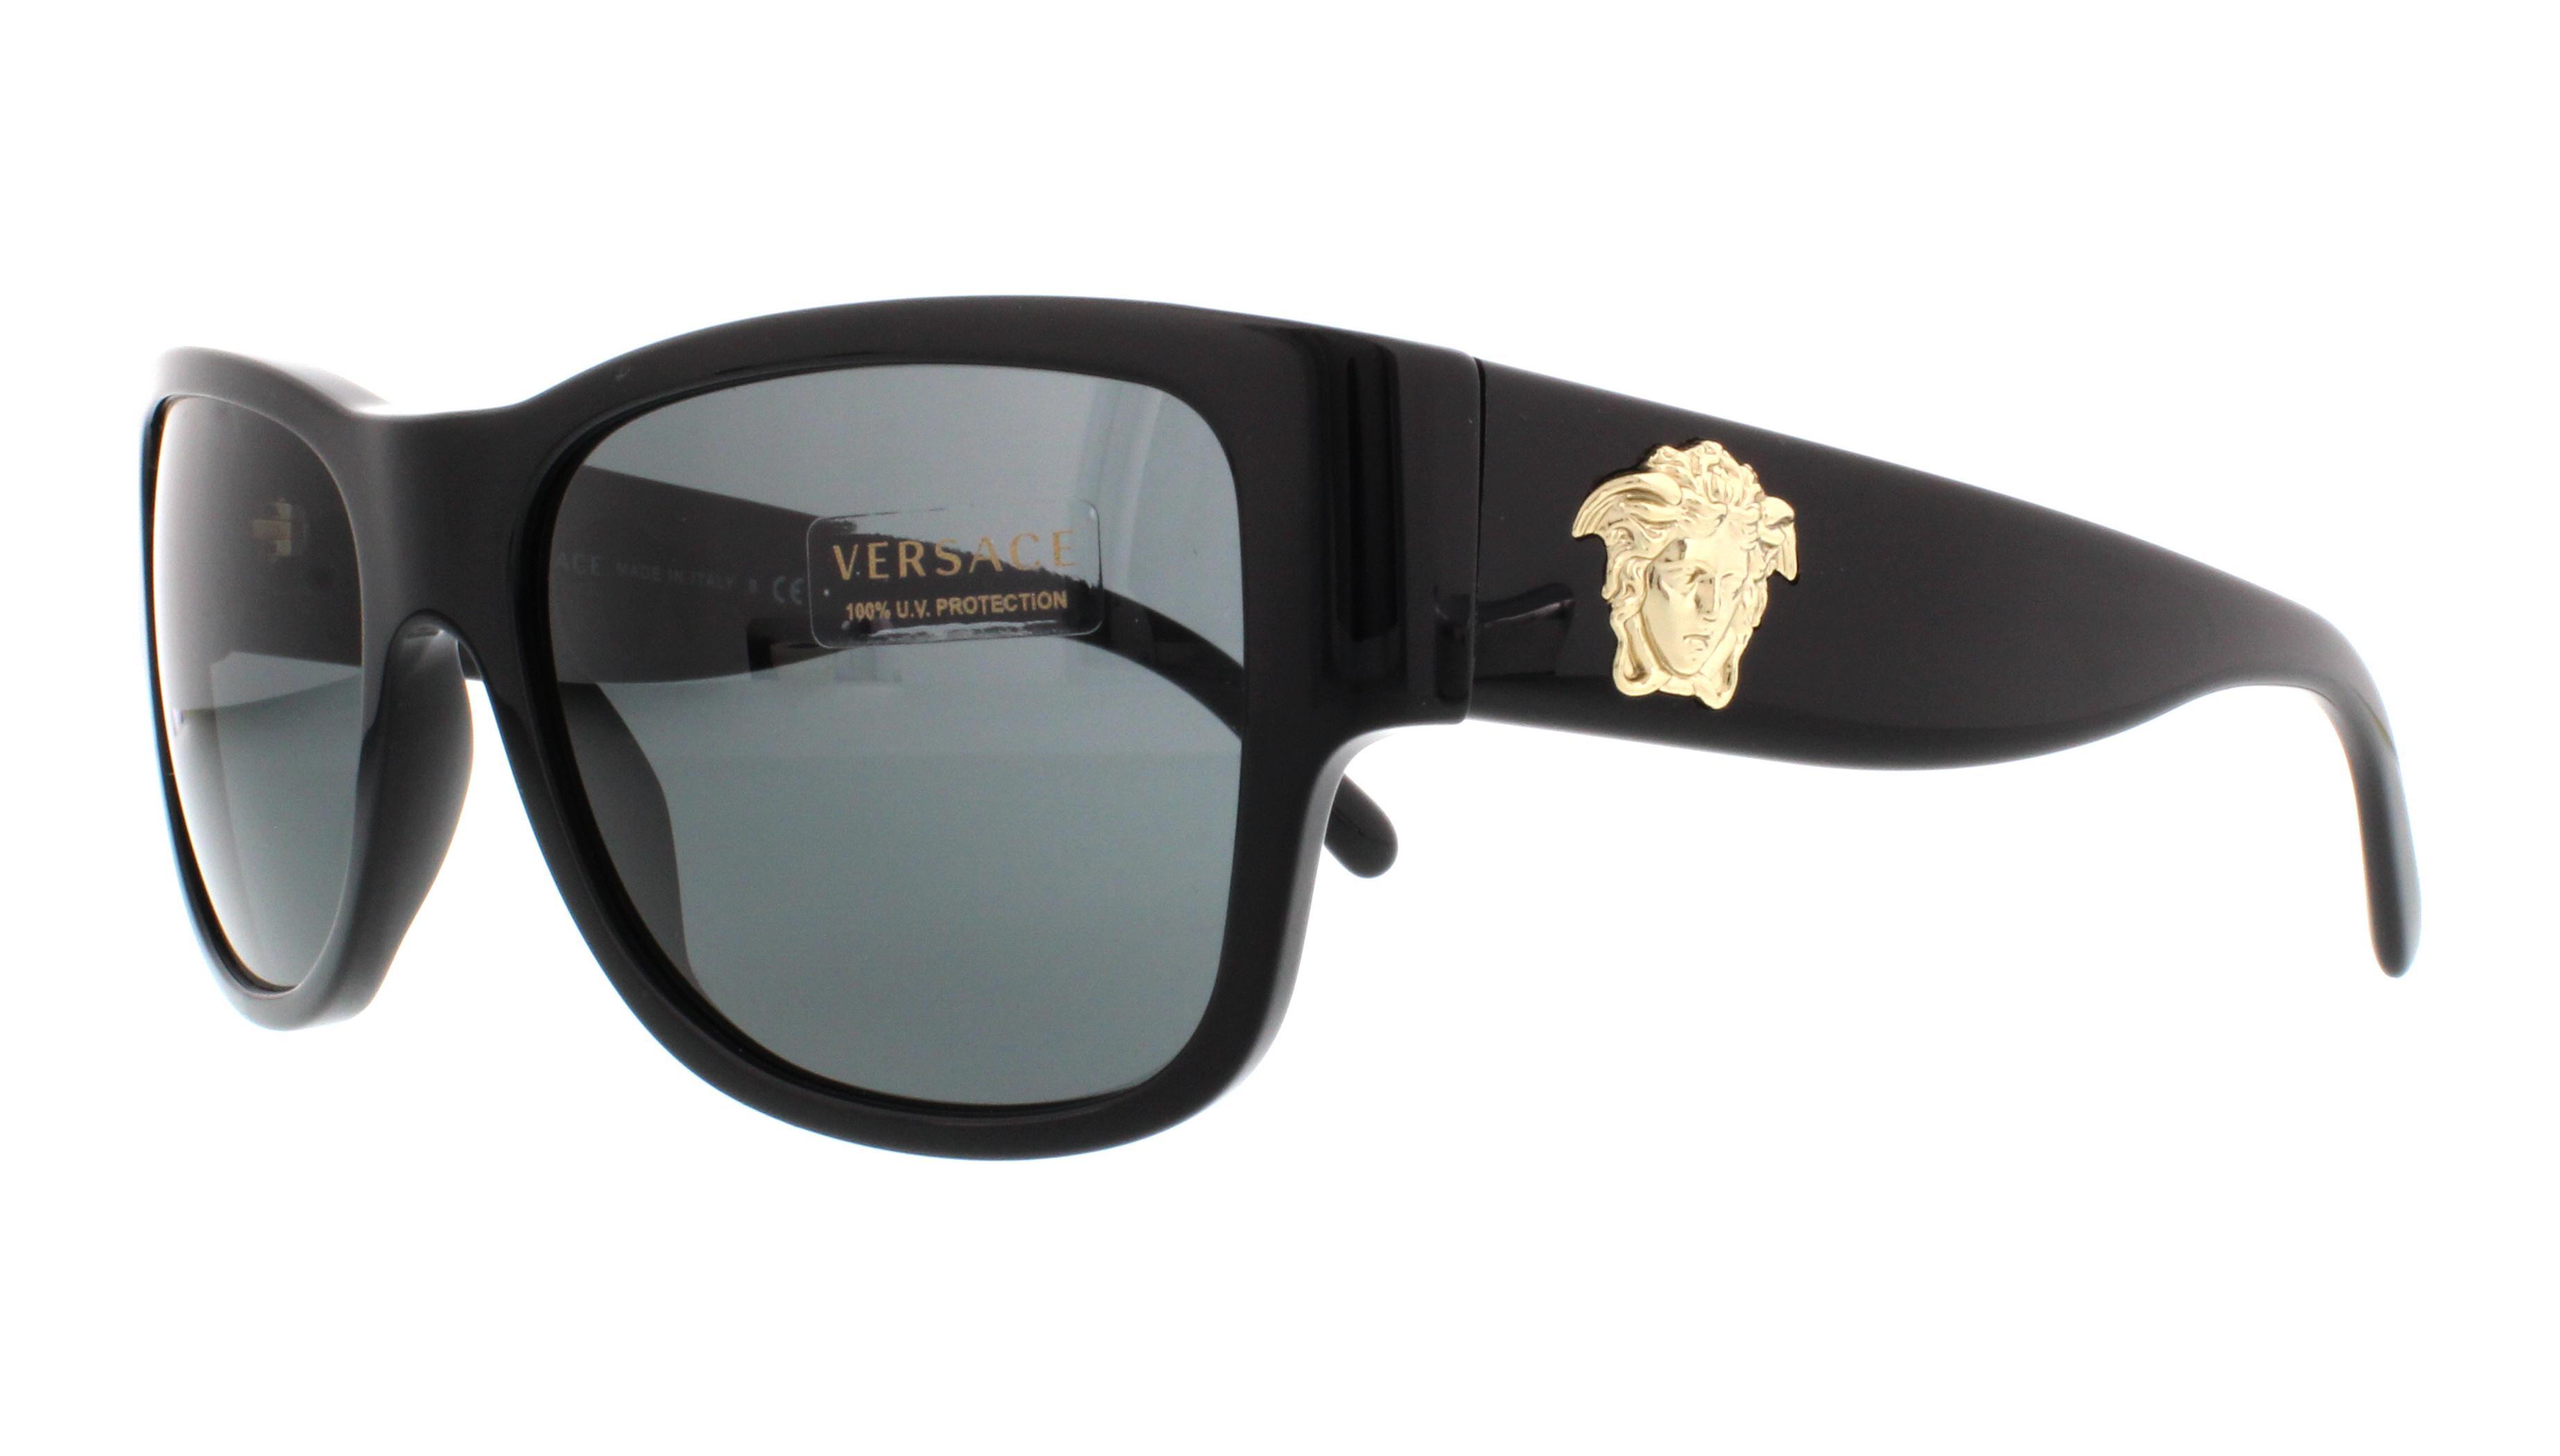 VERSACE Sunglasses VE4275 GB1/87 Black 58MM 8053672278972 | eBay